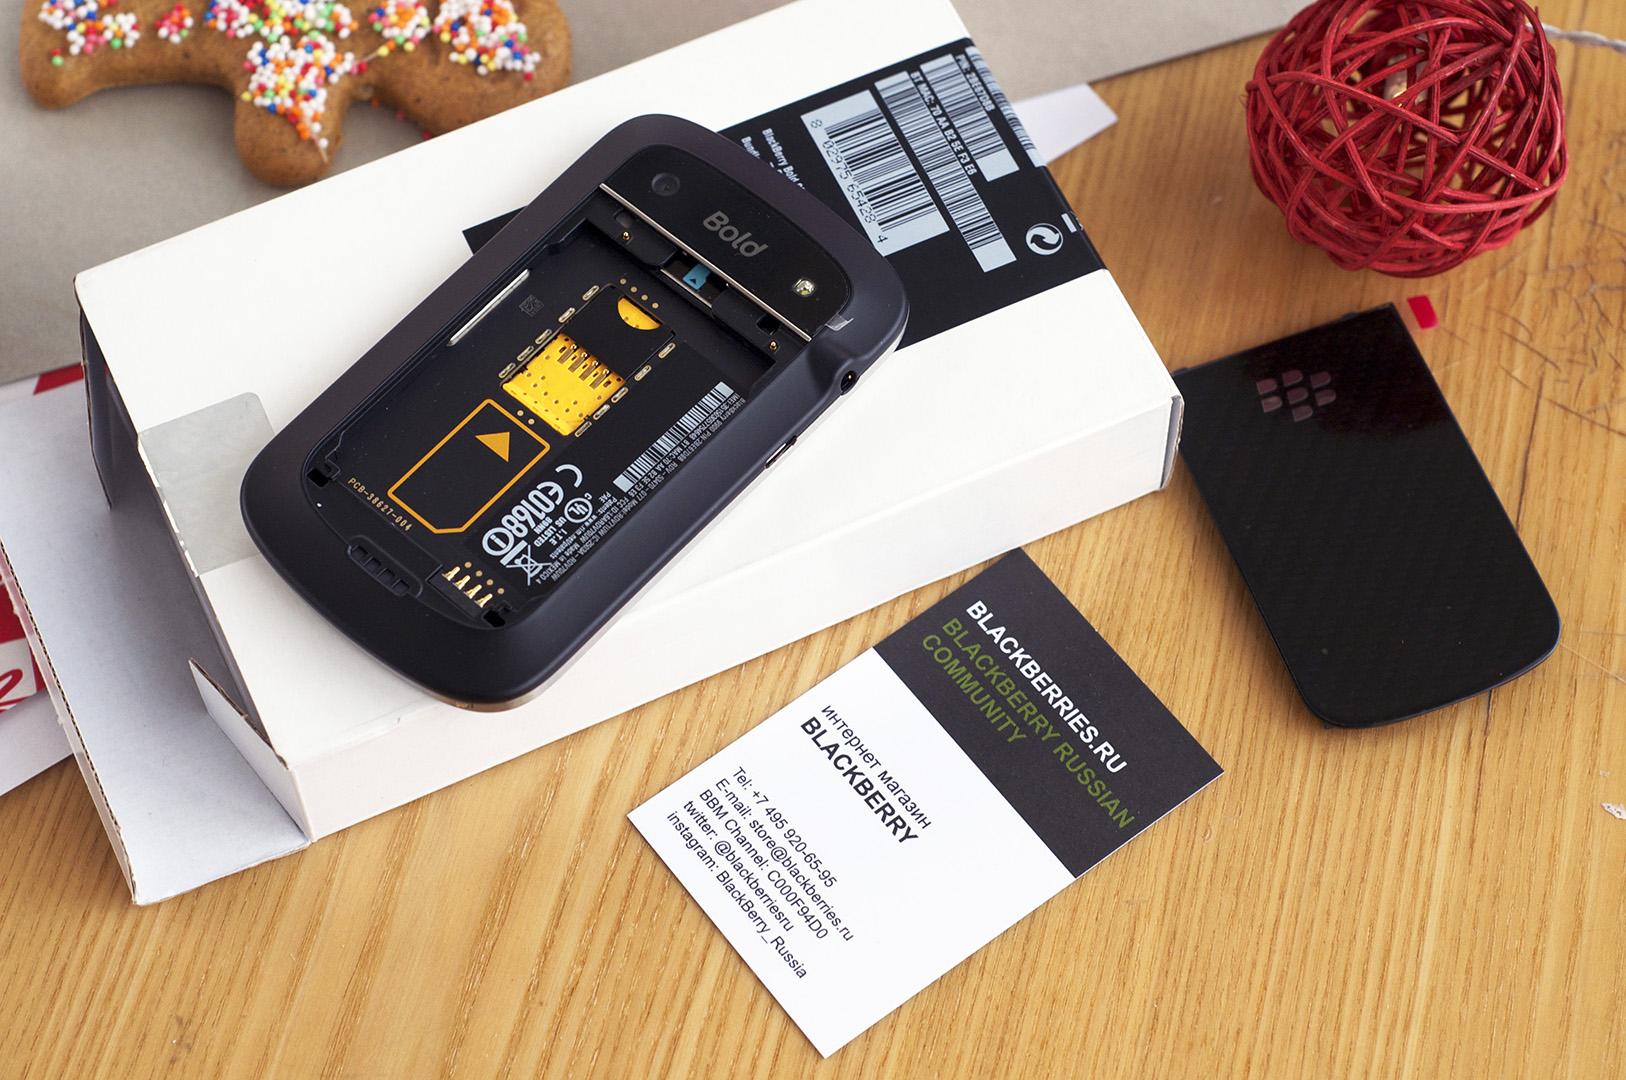 blackberry-9900-bold-2014-4